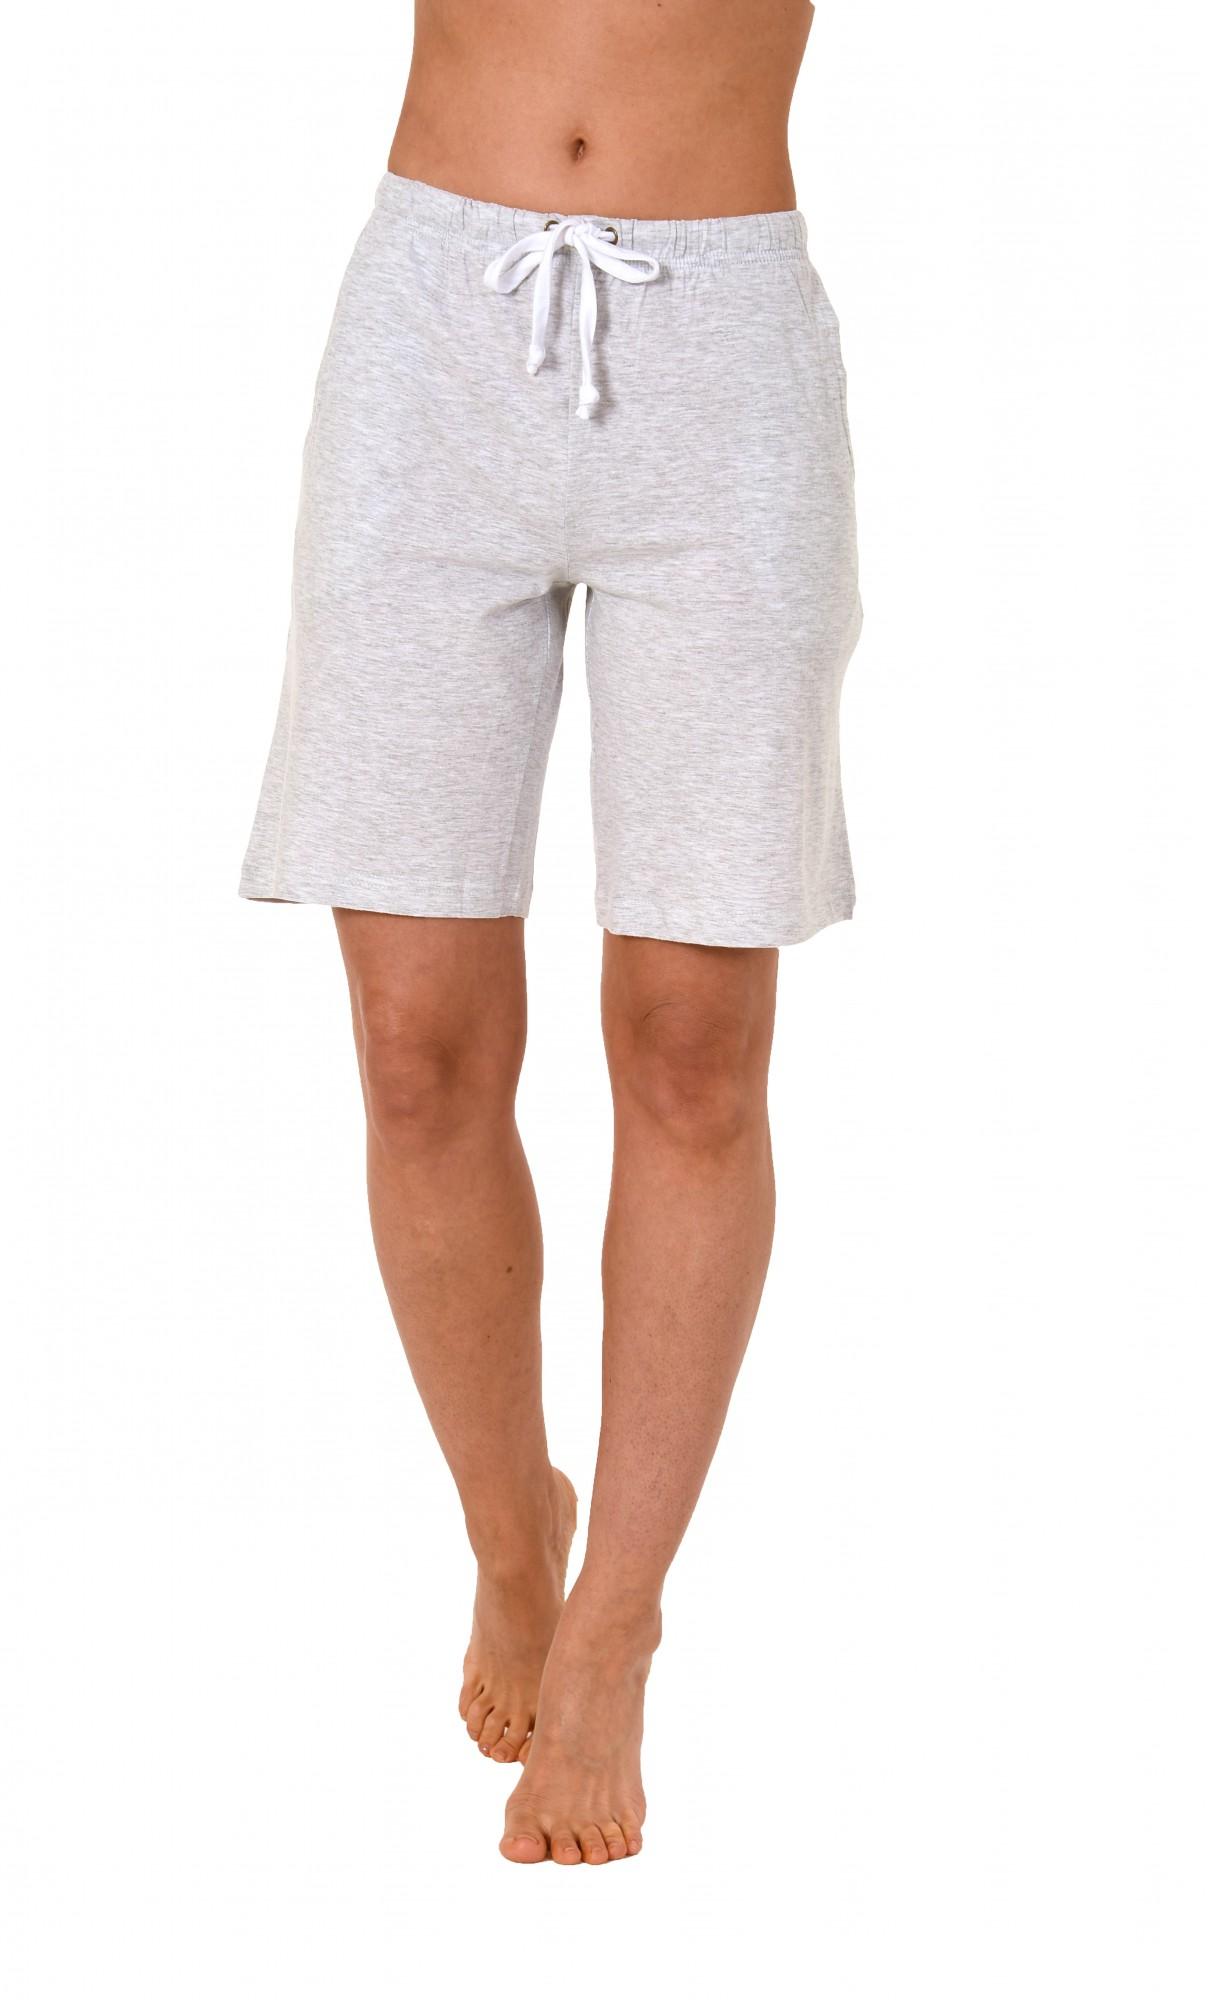 Damen Pyjama Bermuda kurze Hose  - Mix & Match - ideal zum kombinieren  224 90 902 – Bild 2